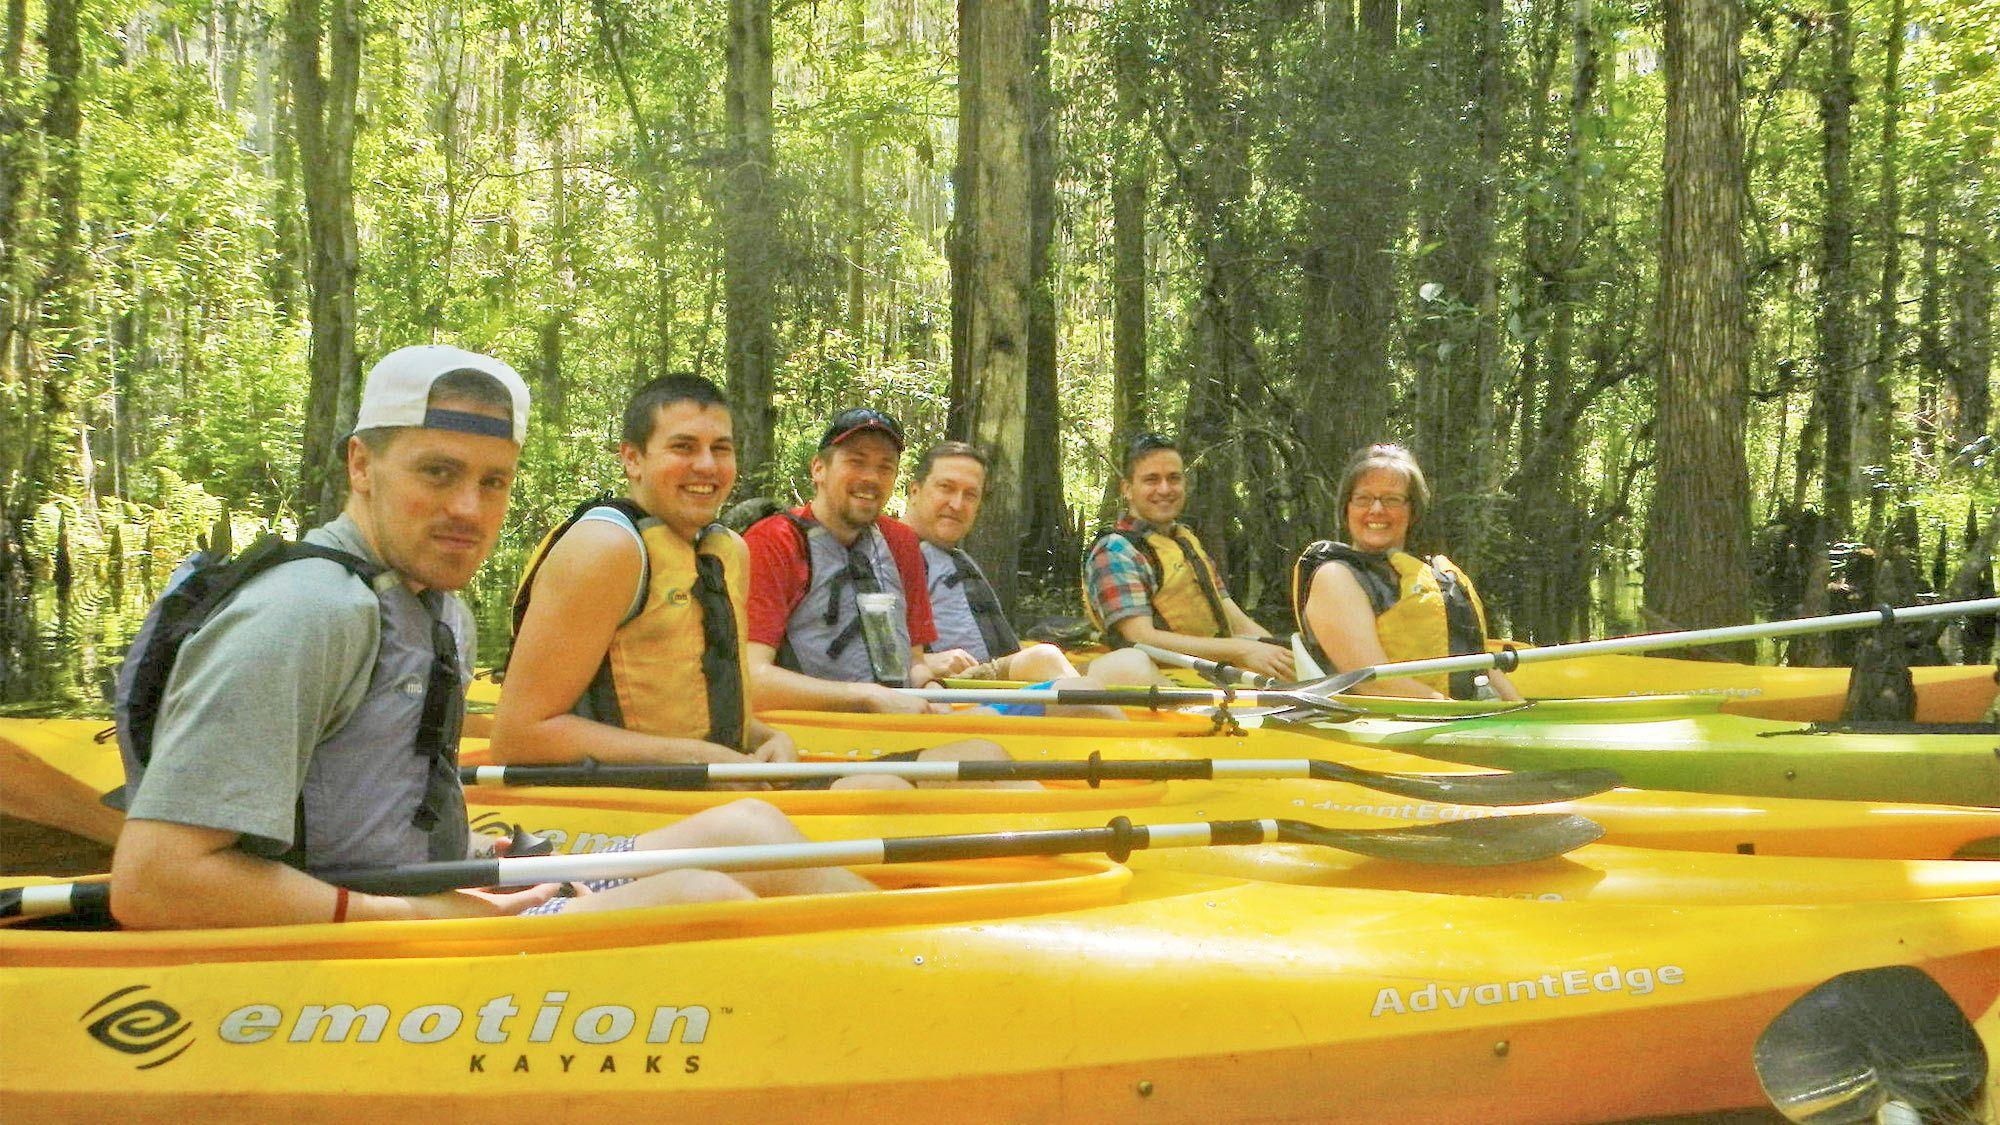 Group in their kayaks on the Kayak Adventure Tour in Orlando